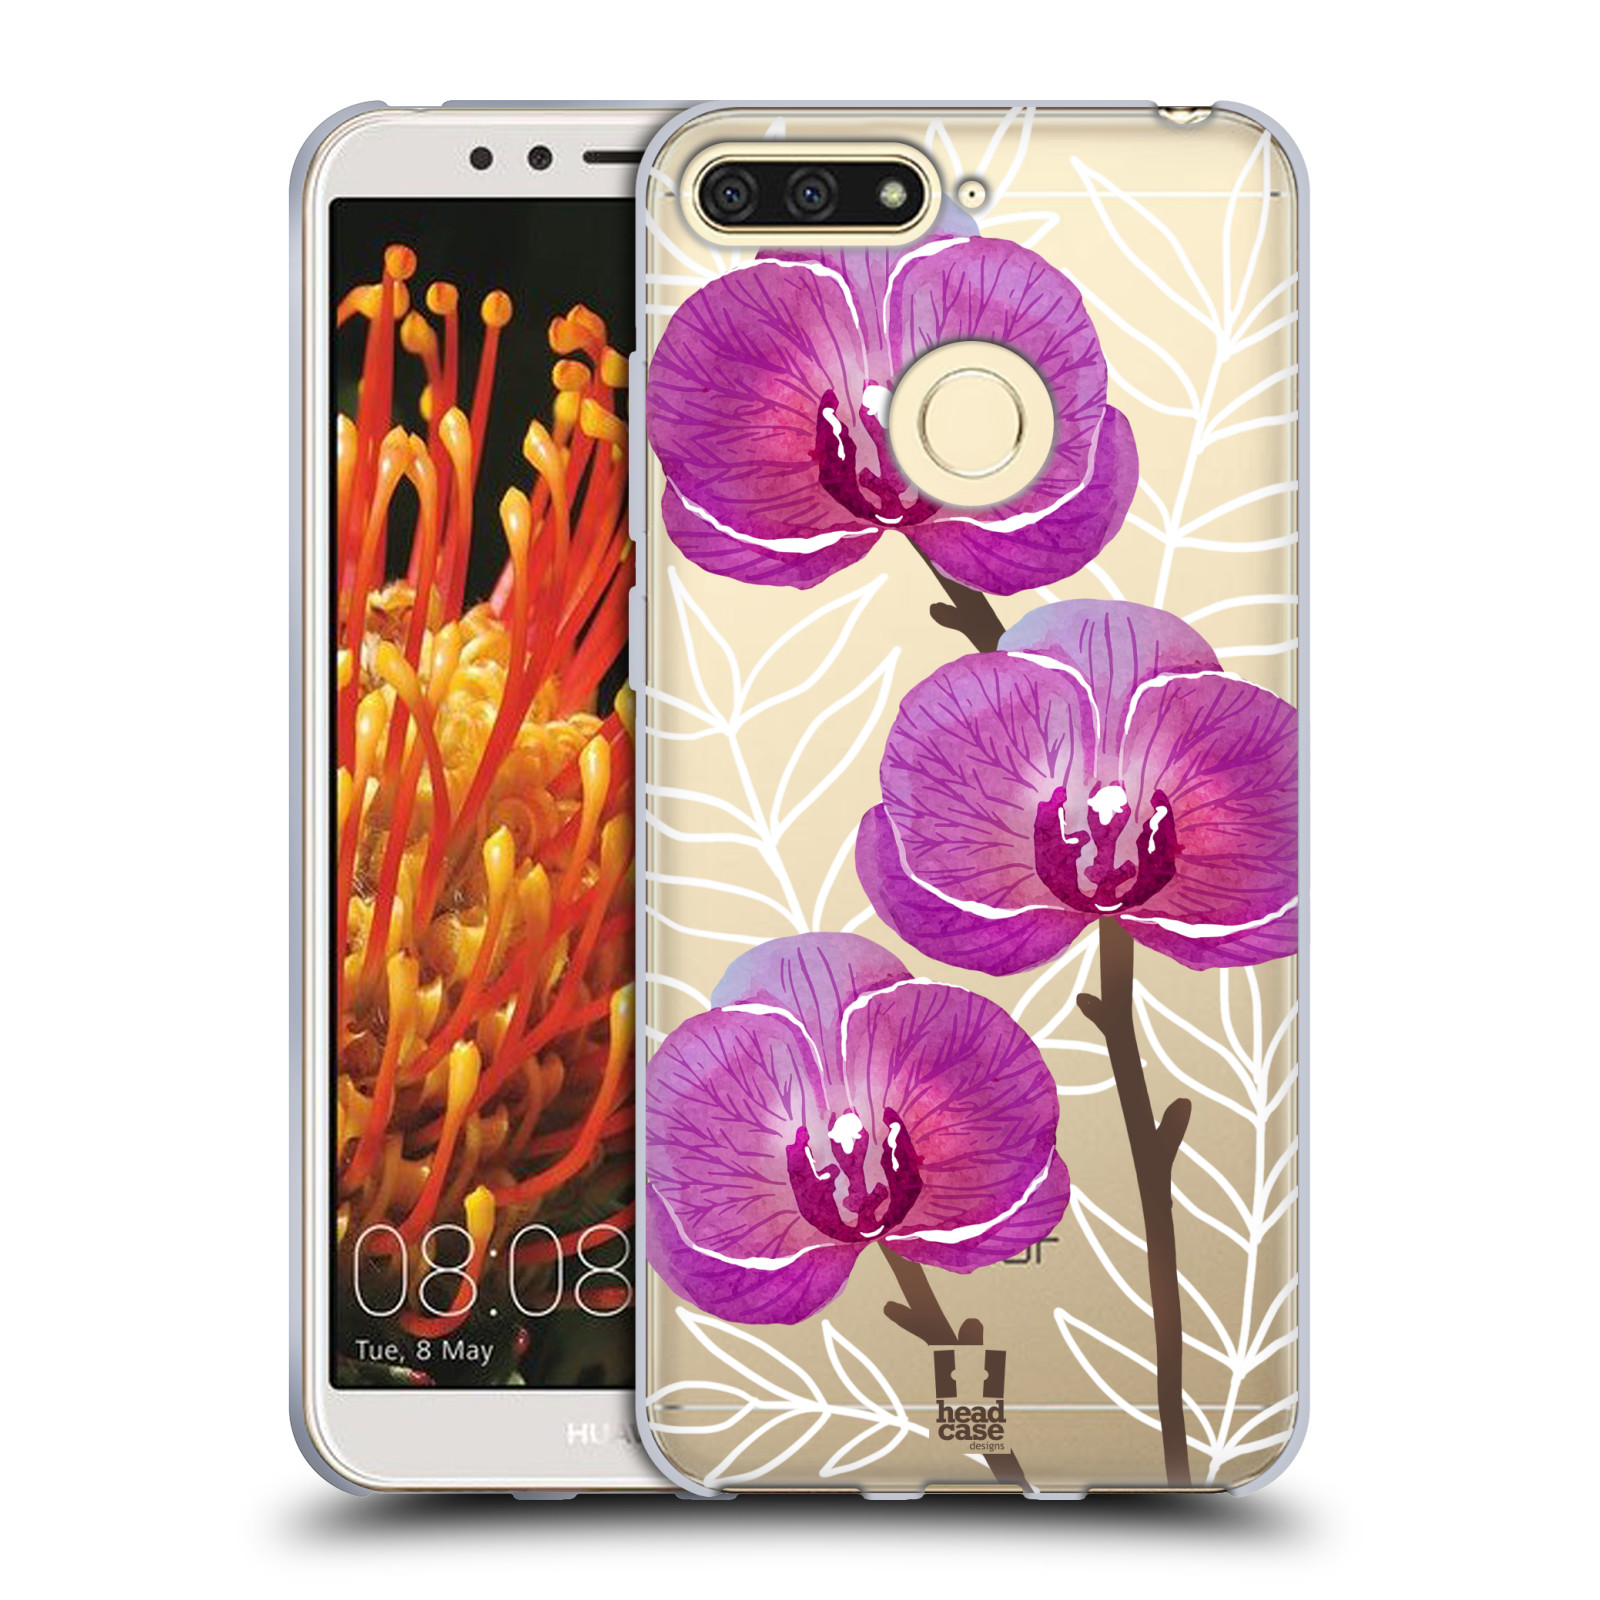 Silikonové pouzdro na mobil Honor 7A - Head Case - Hezoučké kvítky - průhledné